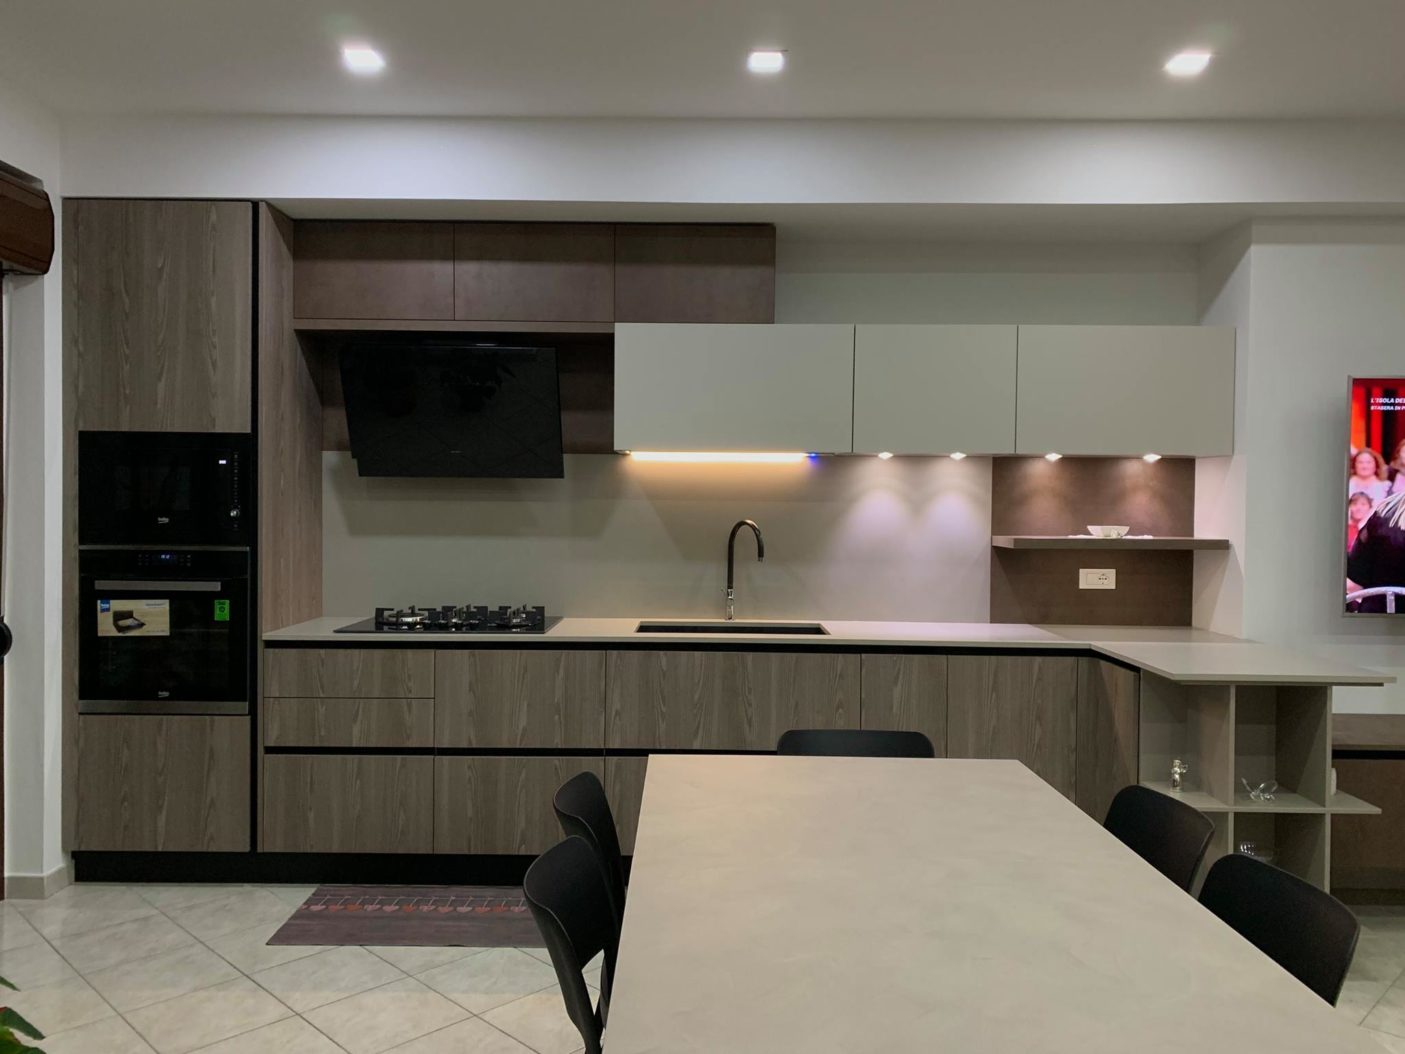 Cucina-Creo-Kitchens-Tablet-Stile-moderno5.jpg